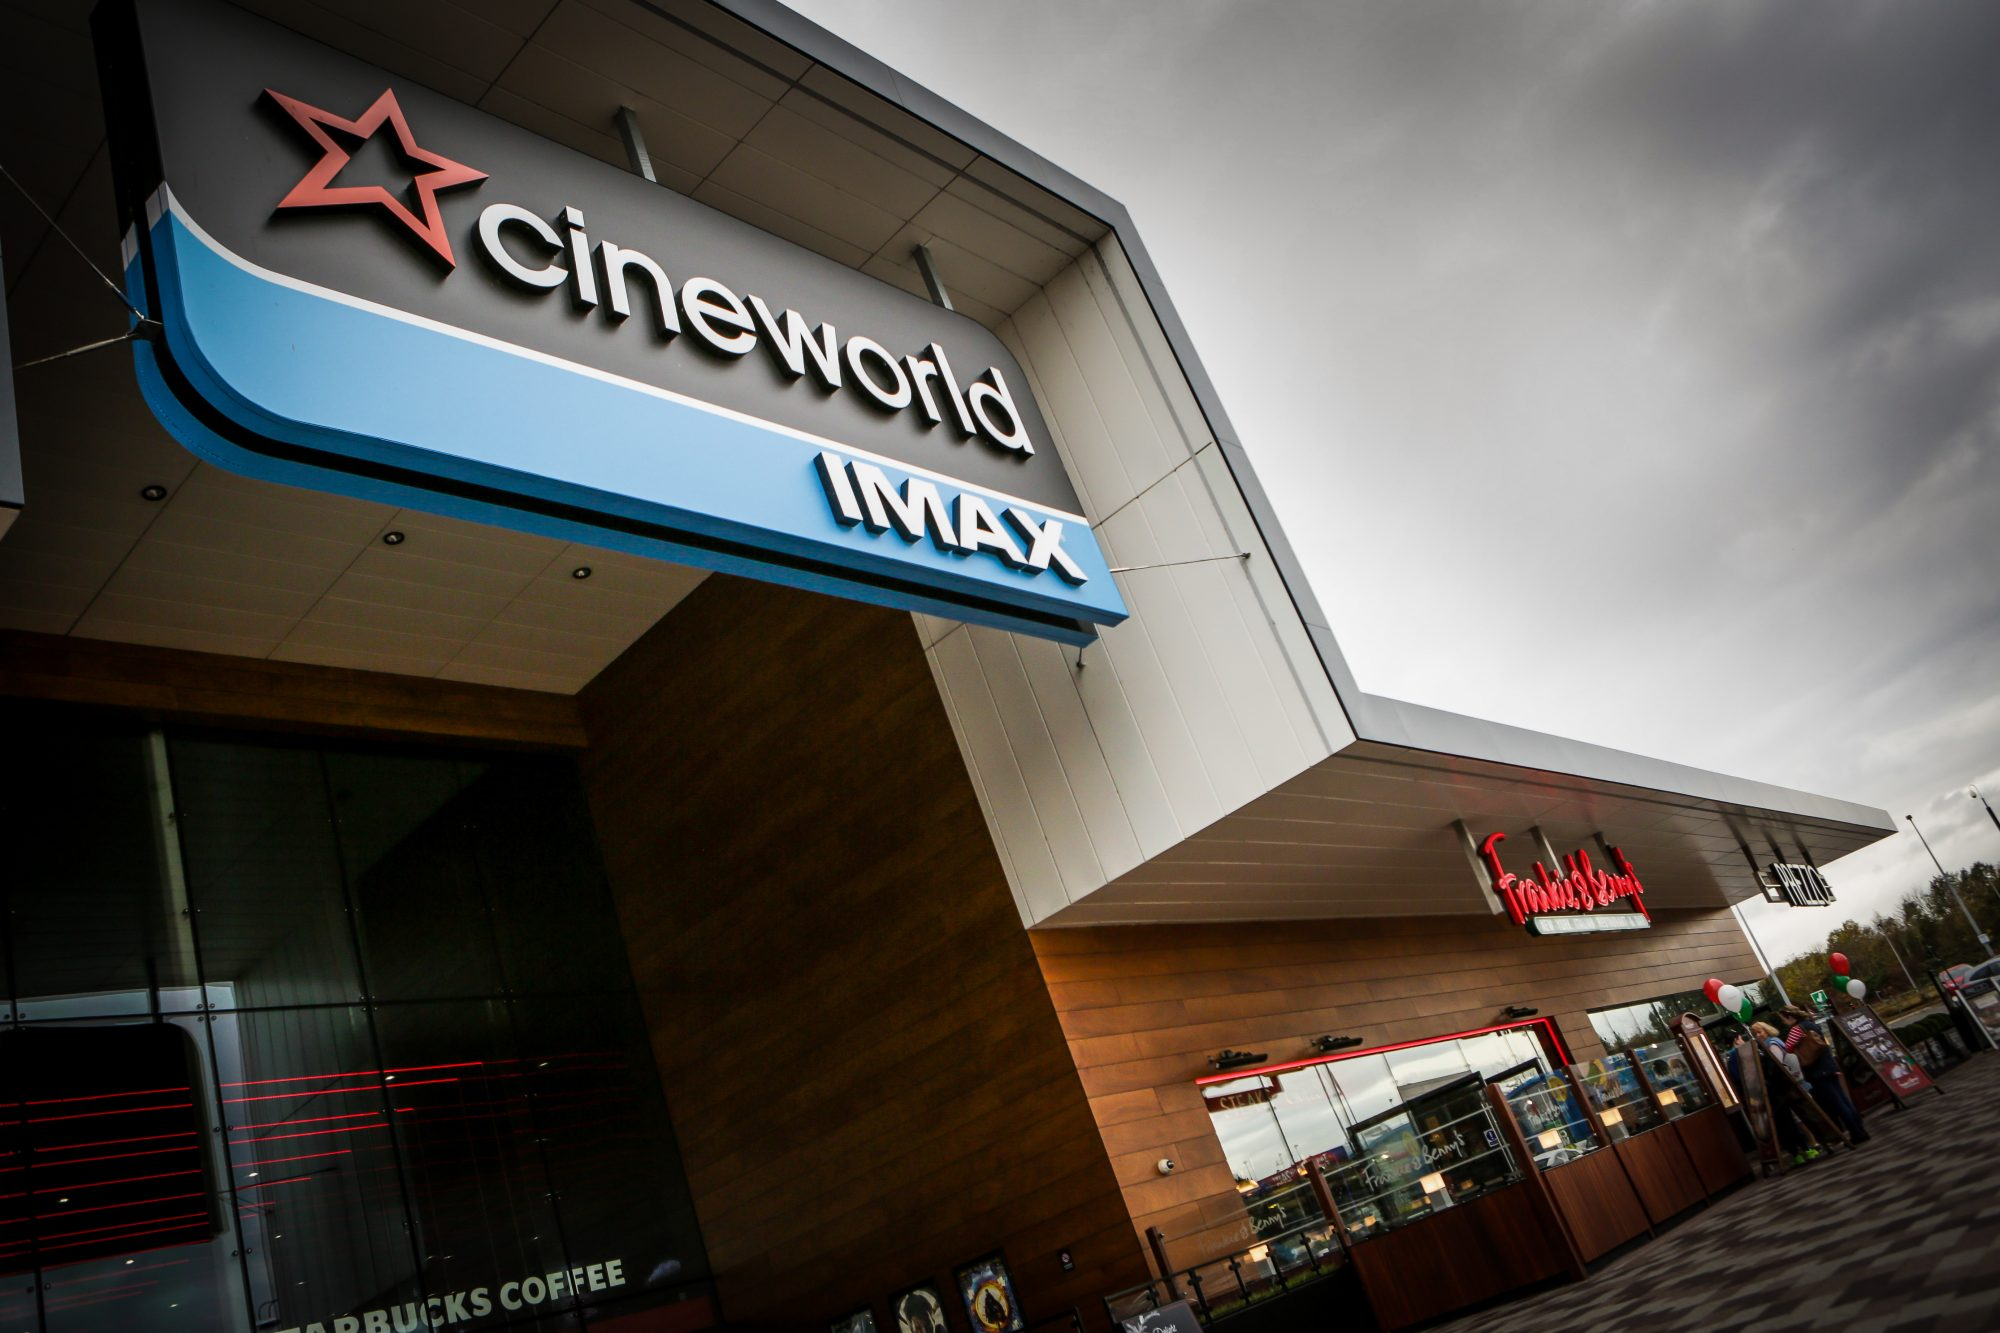 Broughton Shopping Park Cineworld